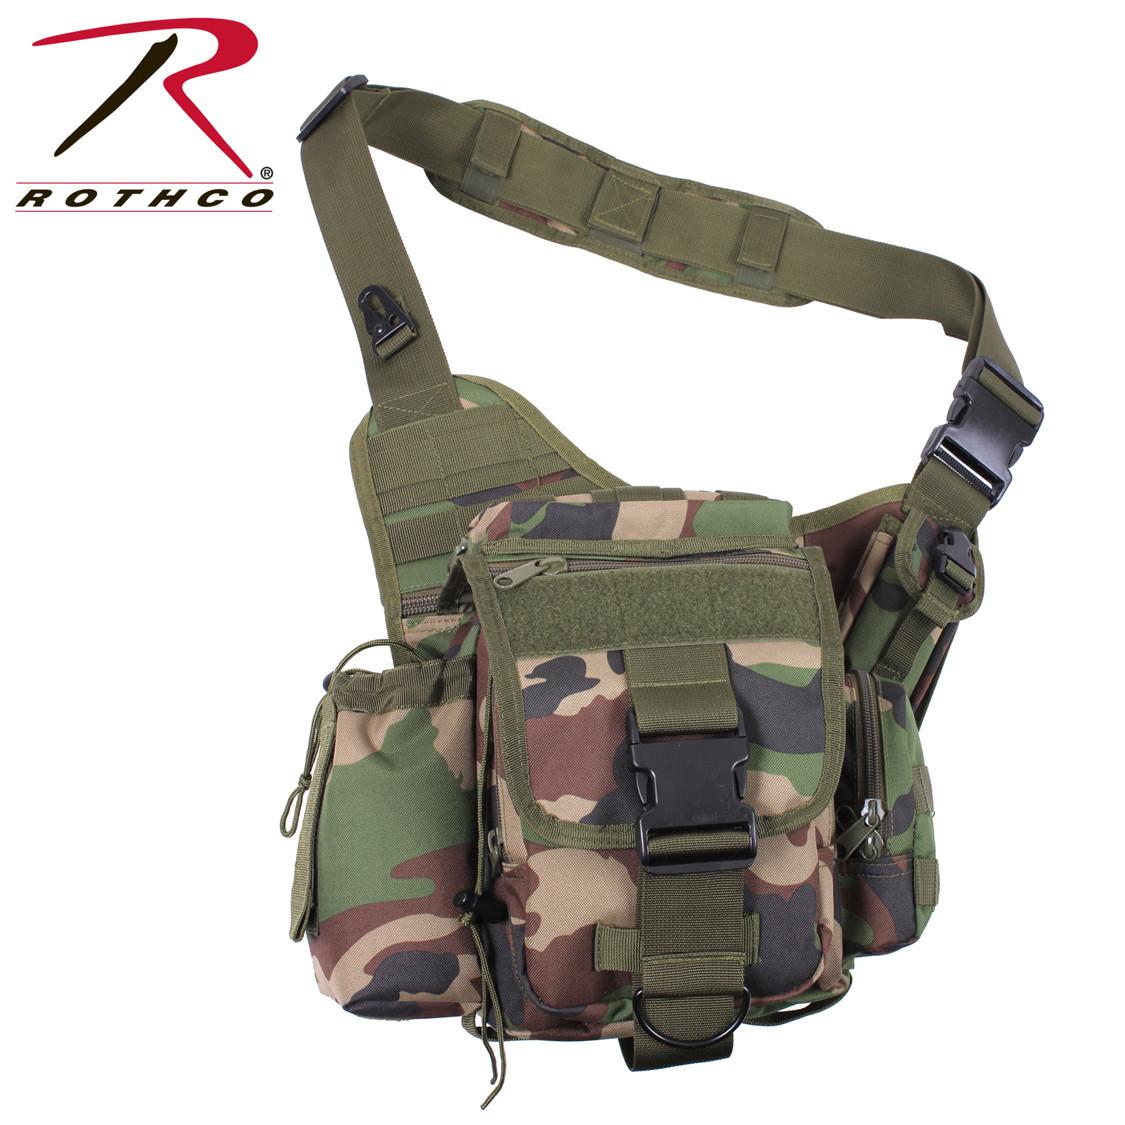 57661e4ac391 Shop Advanced Tactical Camo Sling Bags - Fatigues Army Navy Gear